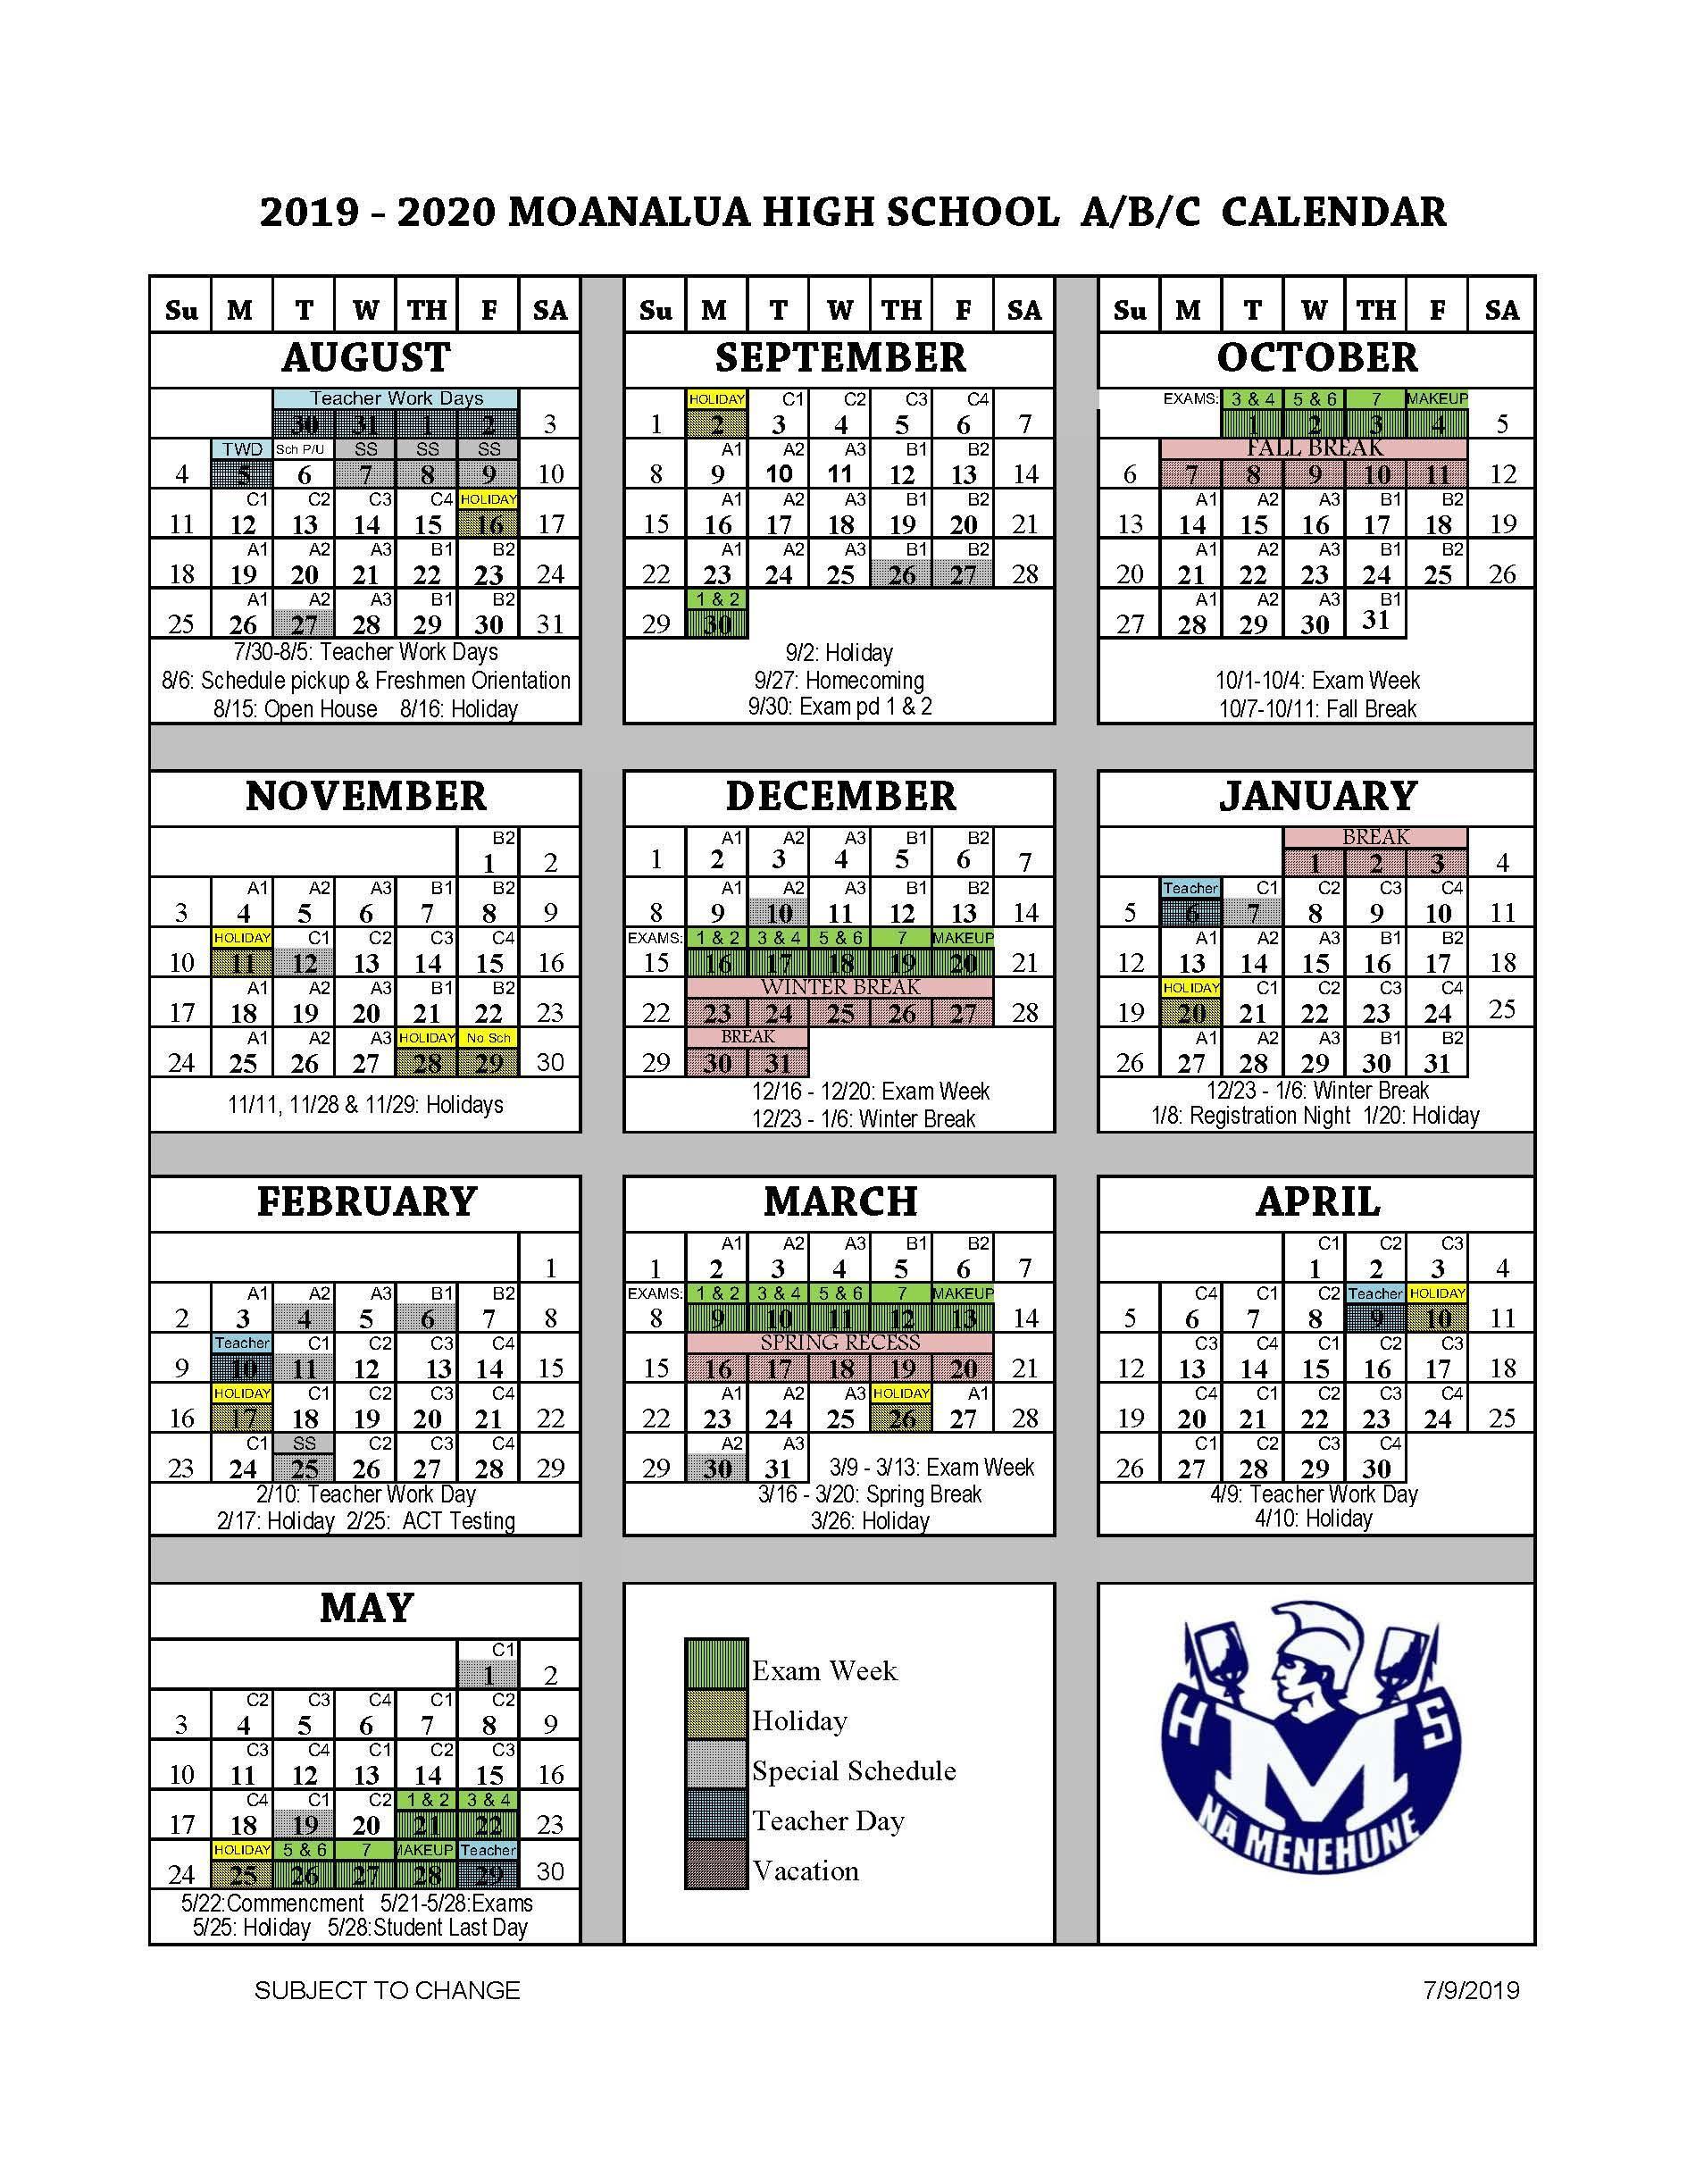 School Year Calendar (A-B-C) – Parents – Moanalua High School